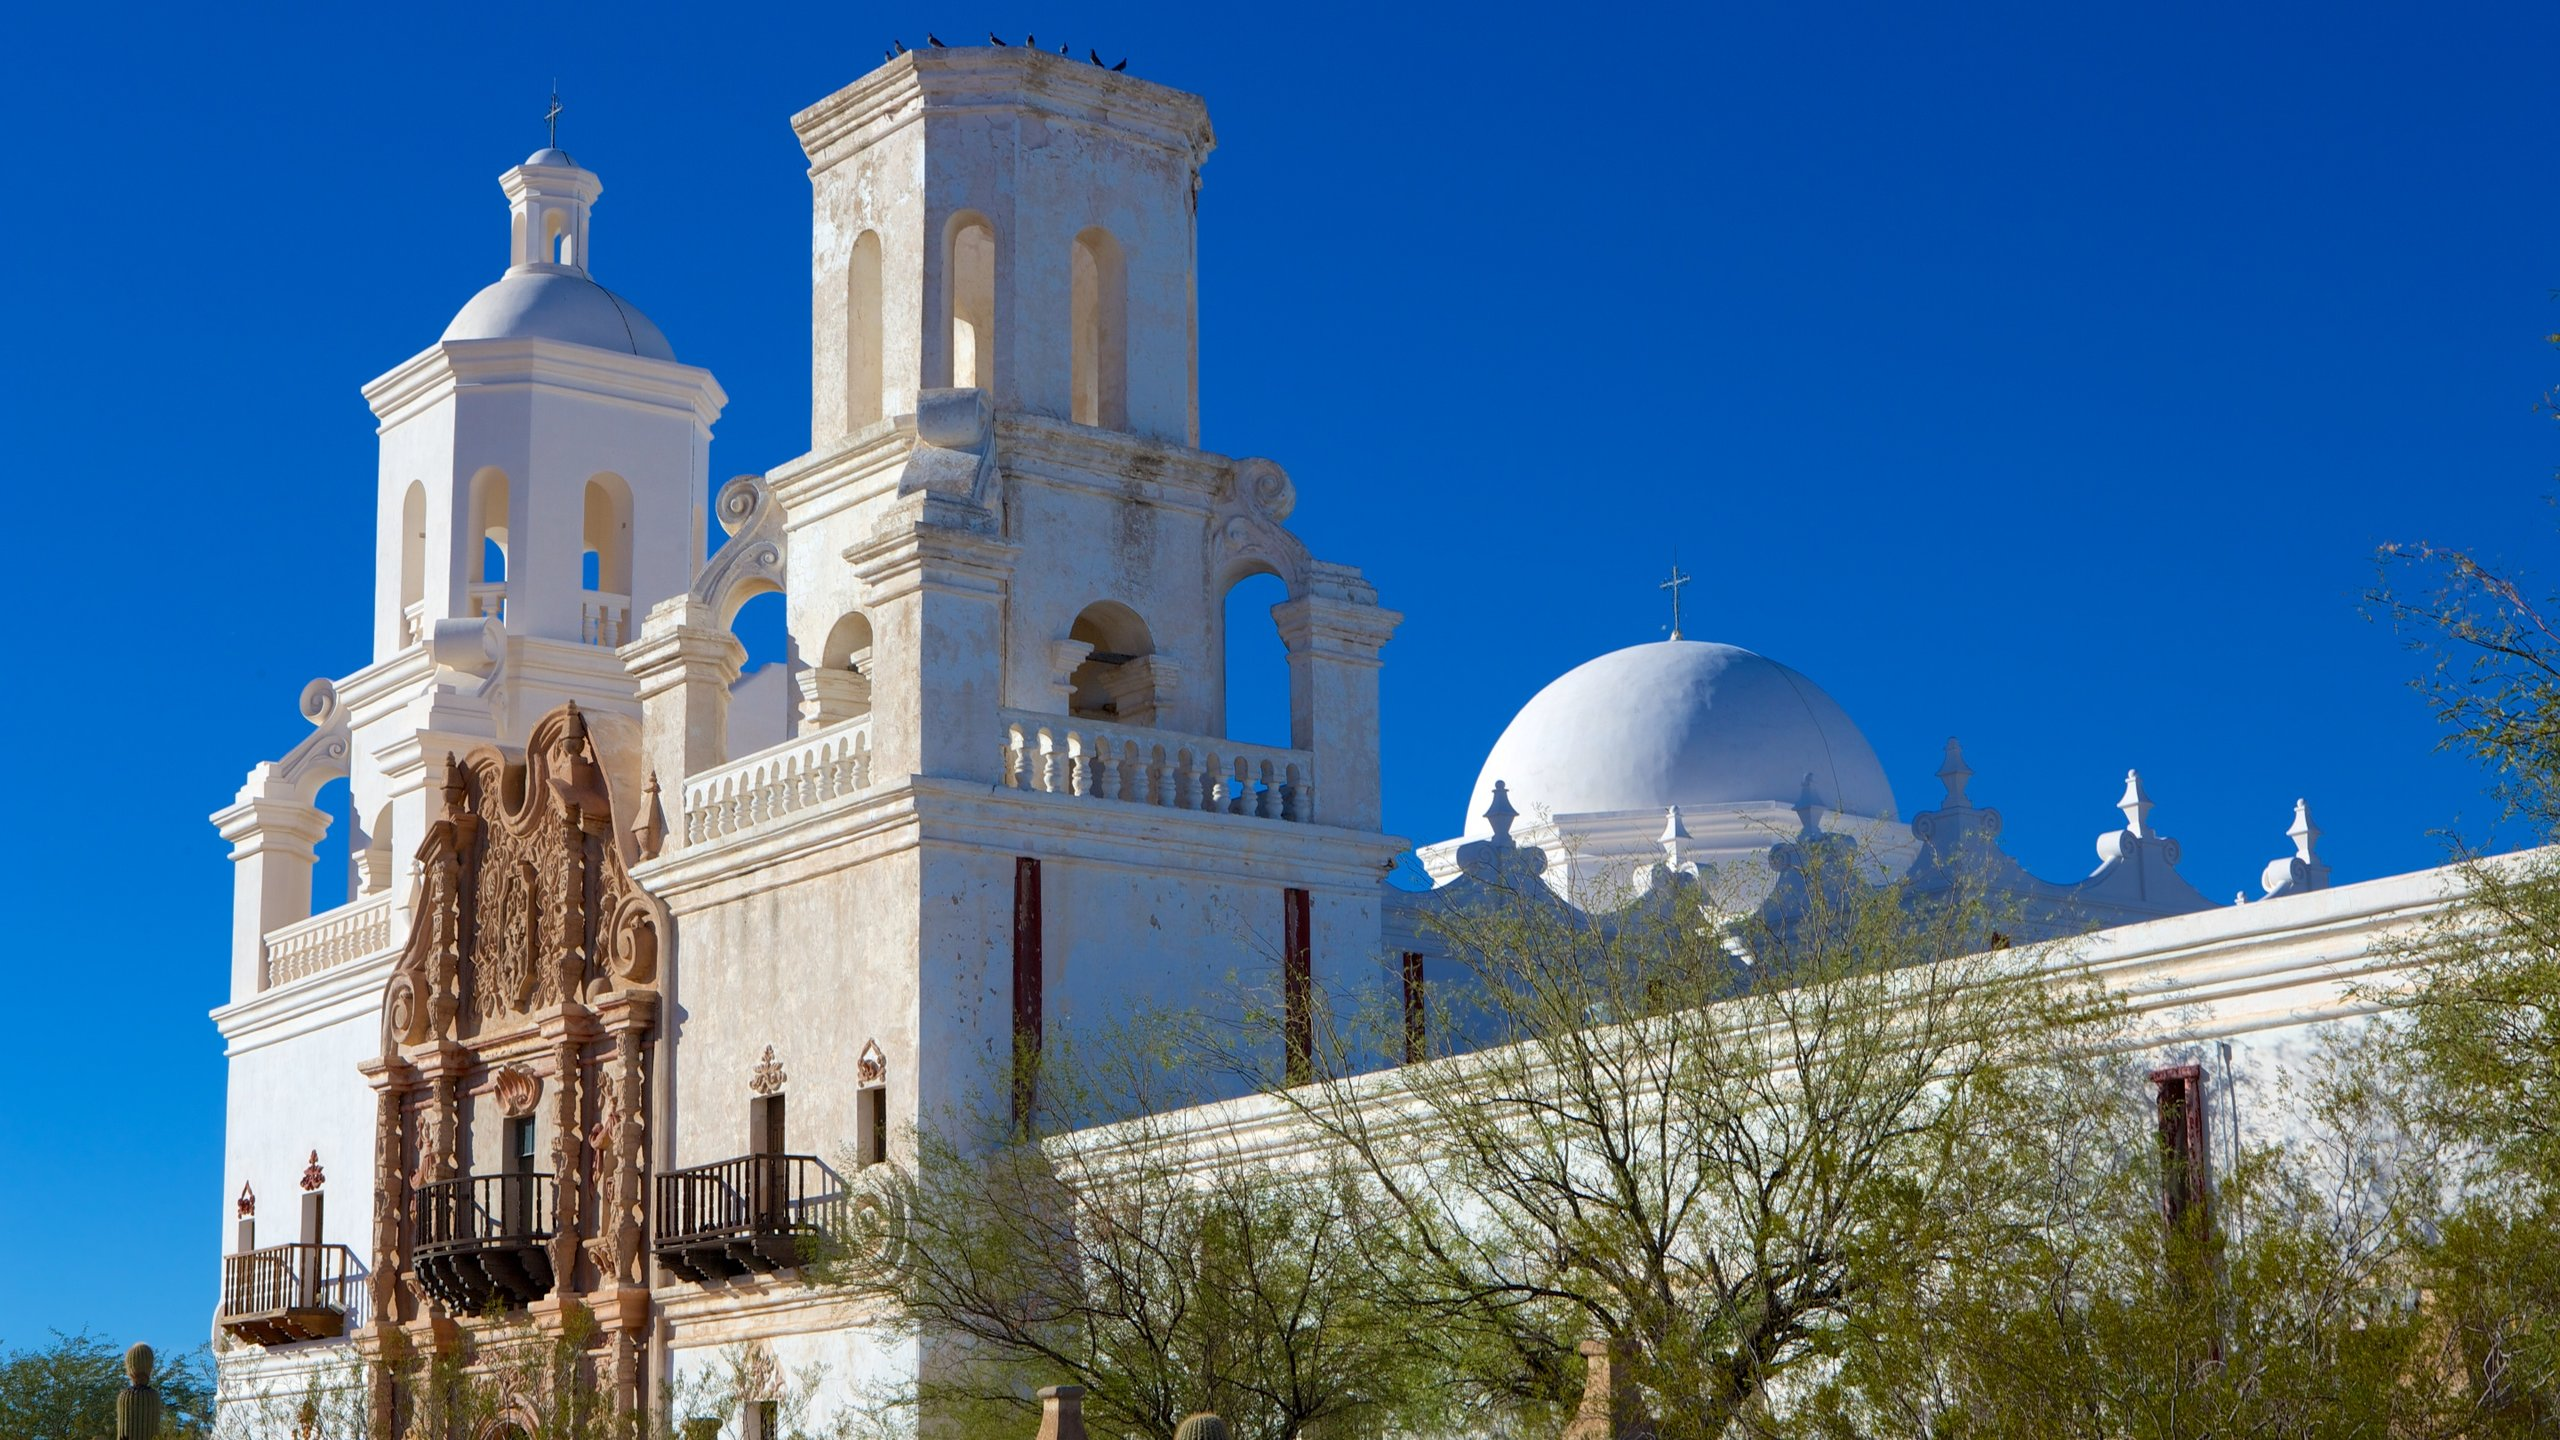 Tucson, Arizona, United States of America